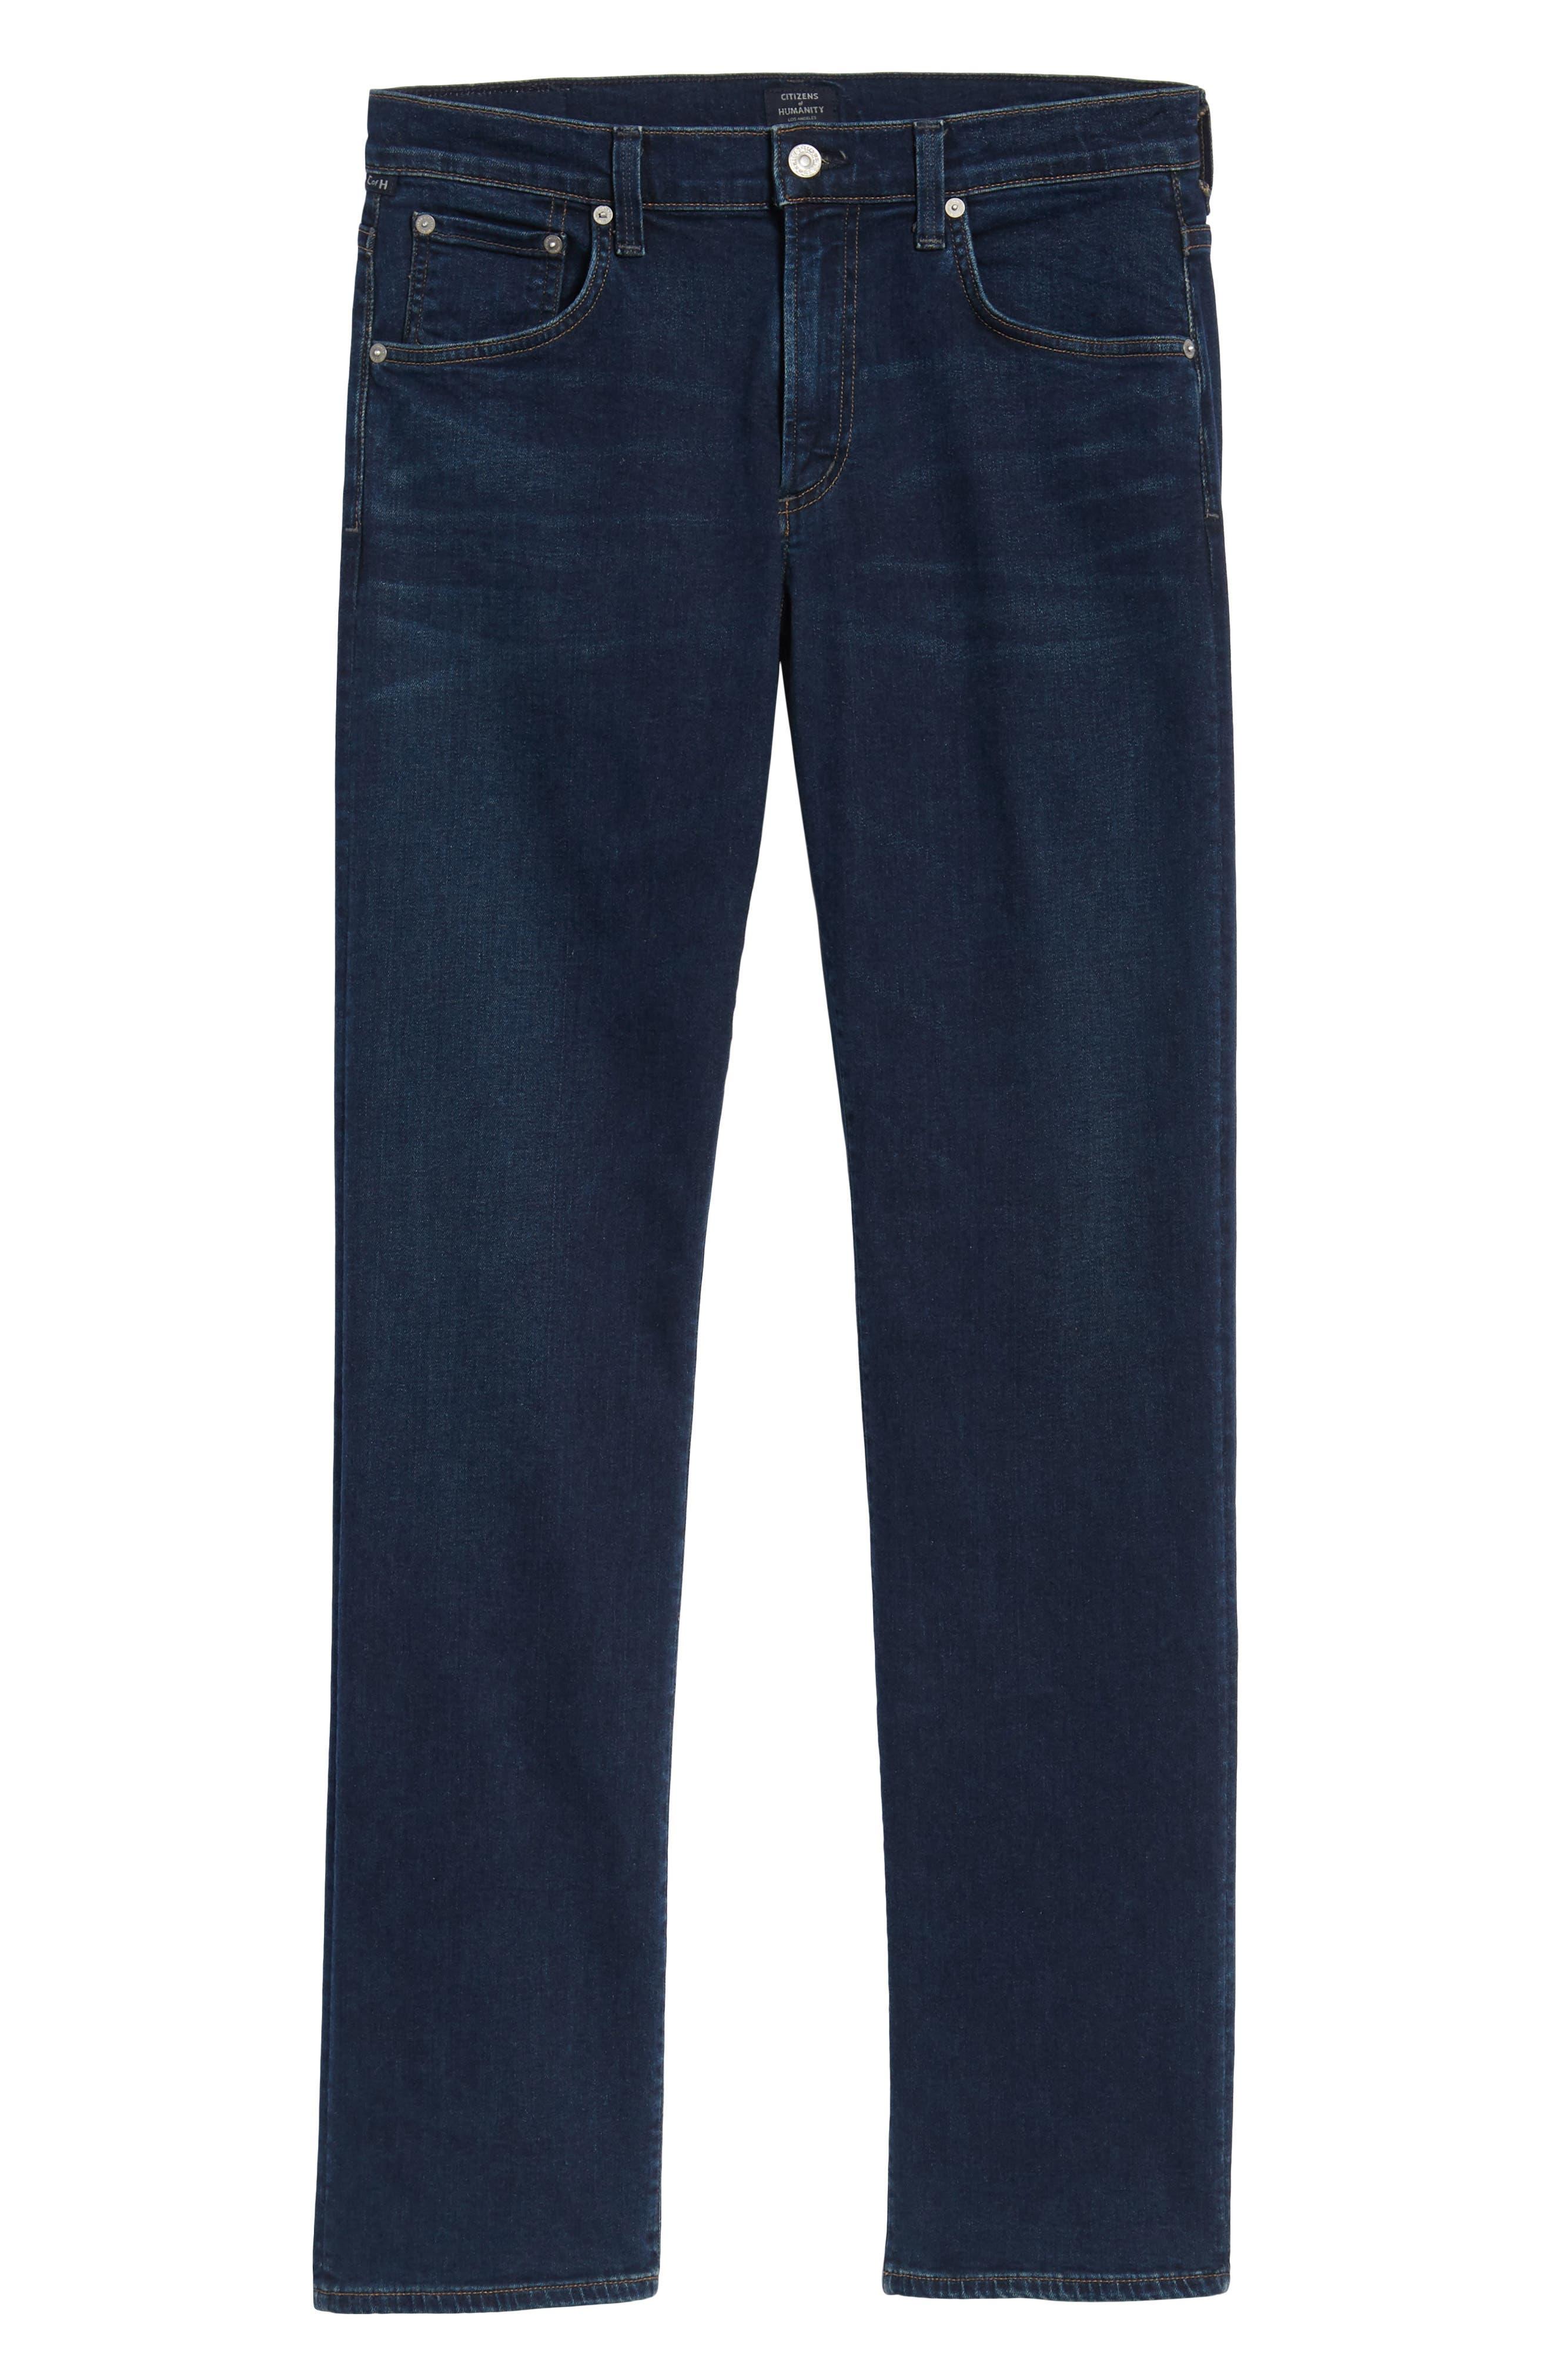 Perform - Sid Straight Leg Jeans,                             Alternate thumbnail 6, color,                             EVERSON